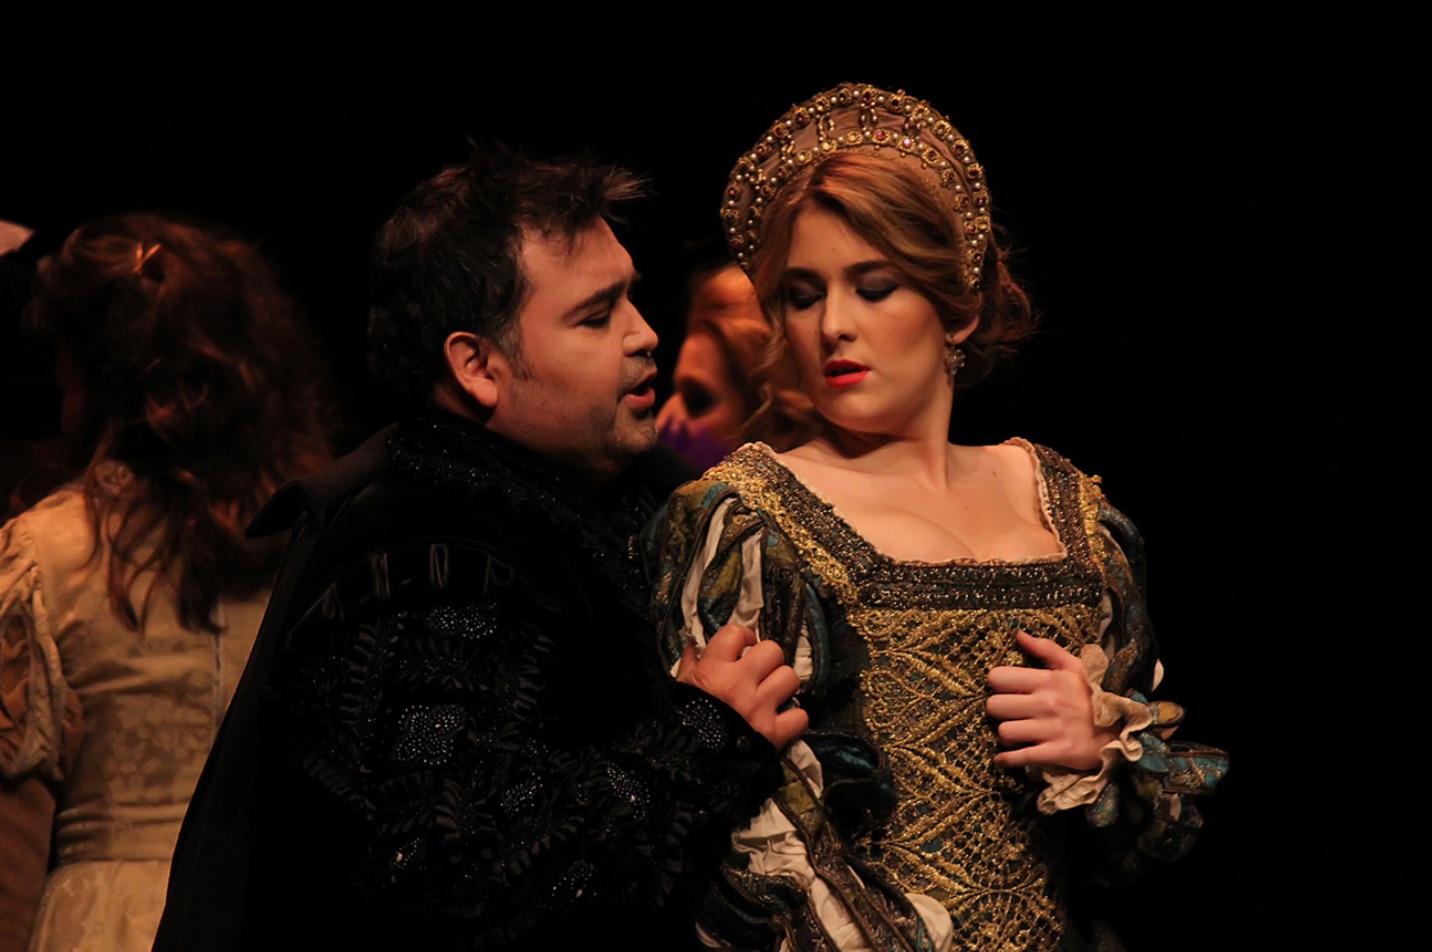 Un Povero Rigoletto en escena